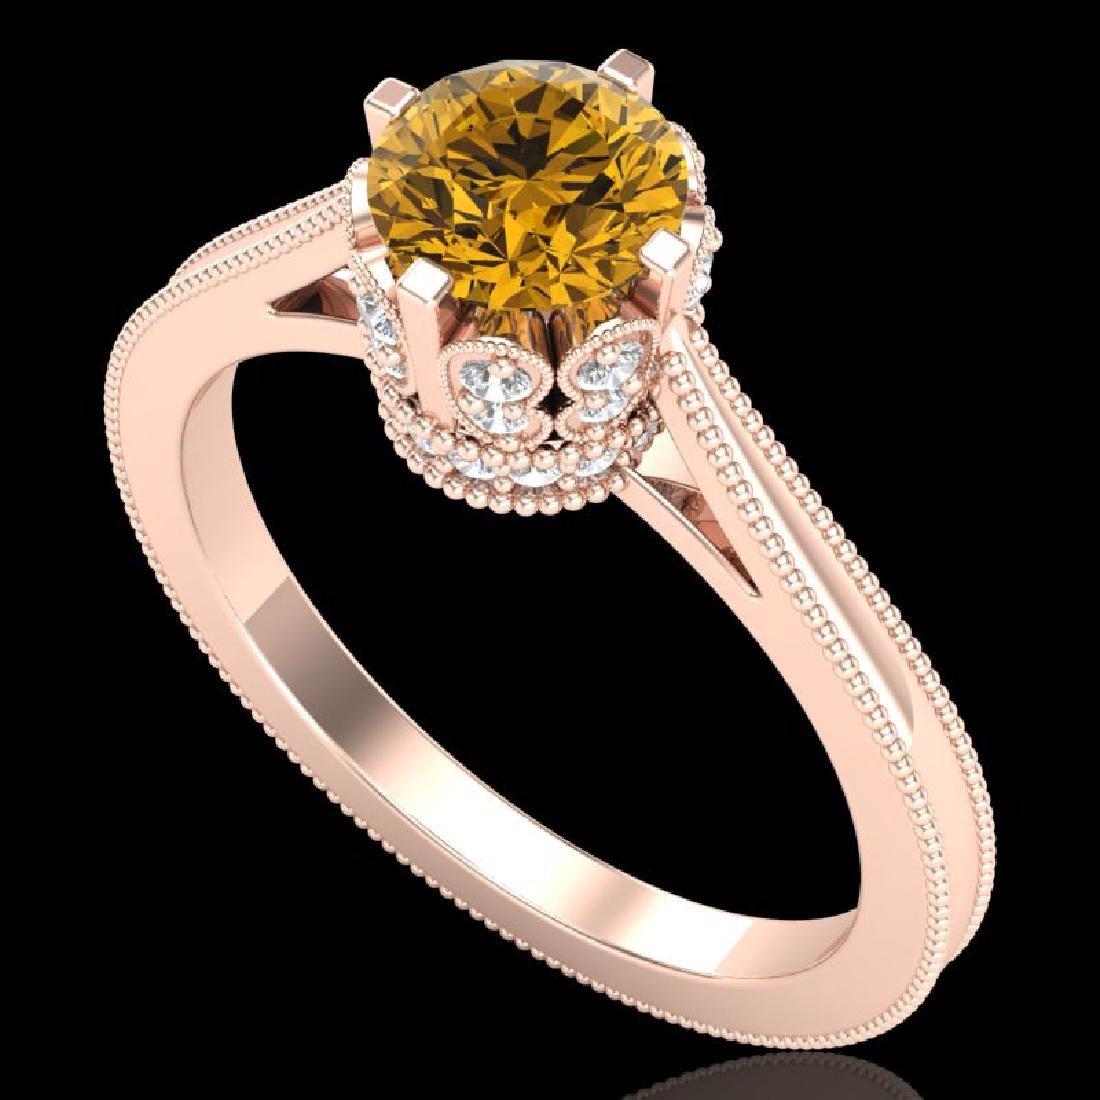 1.14 CTW Intense Fancy Yellow Diamond Engagement Art